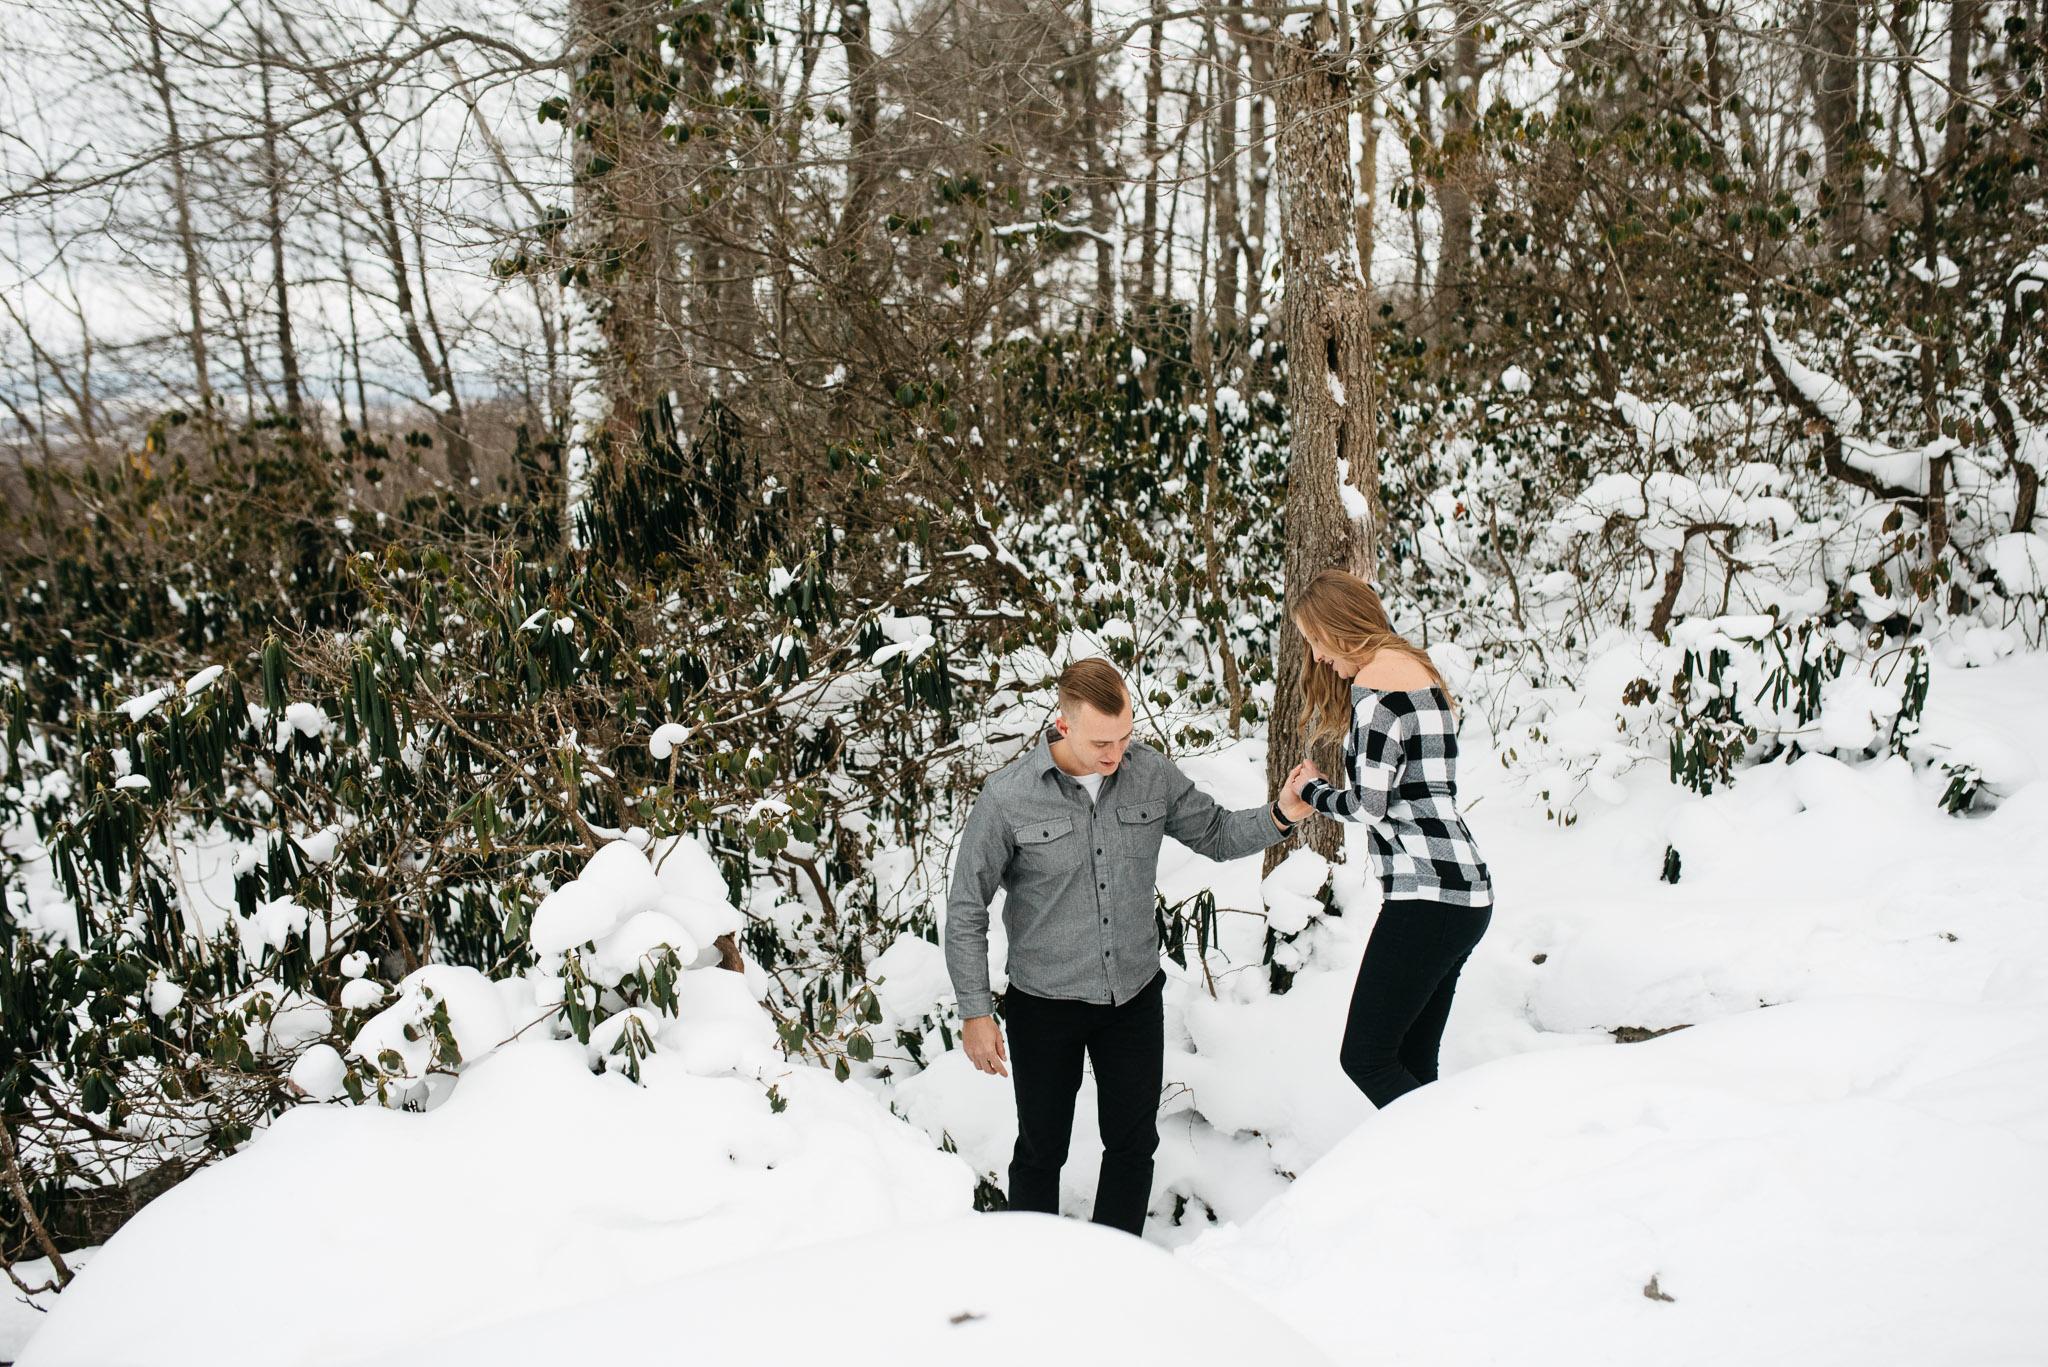 Ligonier-Linn-Run-Engagement-Session-Pittsburgh-Photographer-Mariah-Fisher-1.jpg